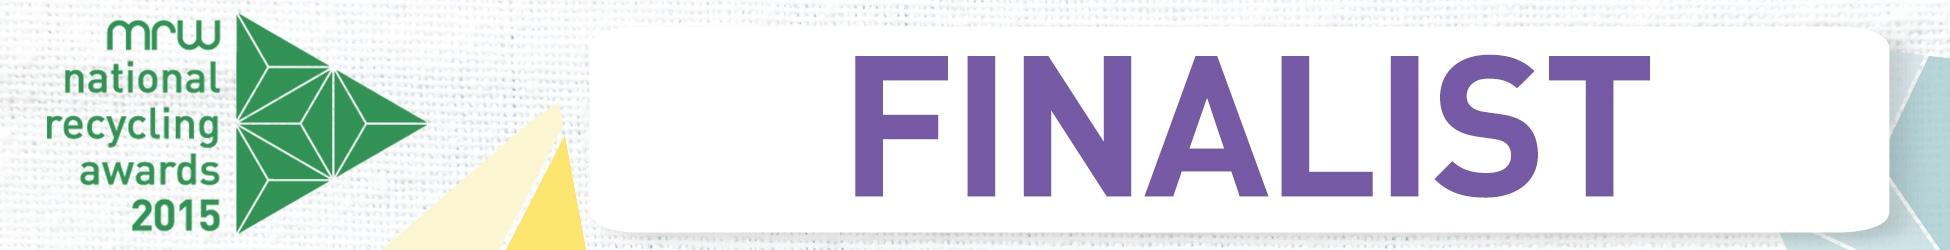 NR_AWD14-FINALIST BANNERS_FINALIST